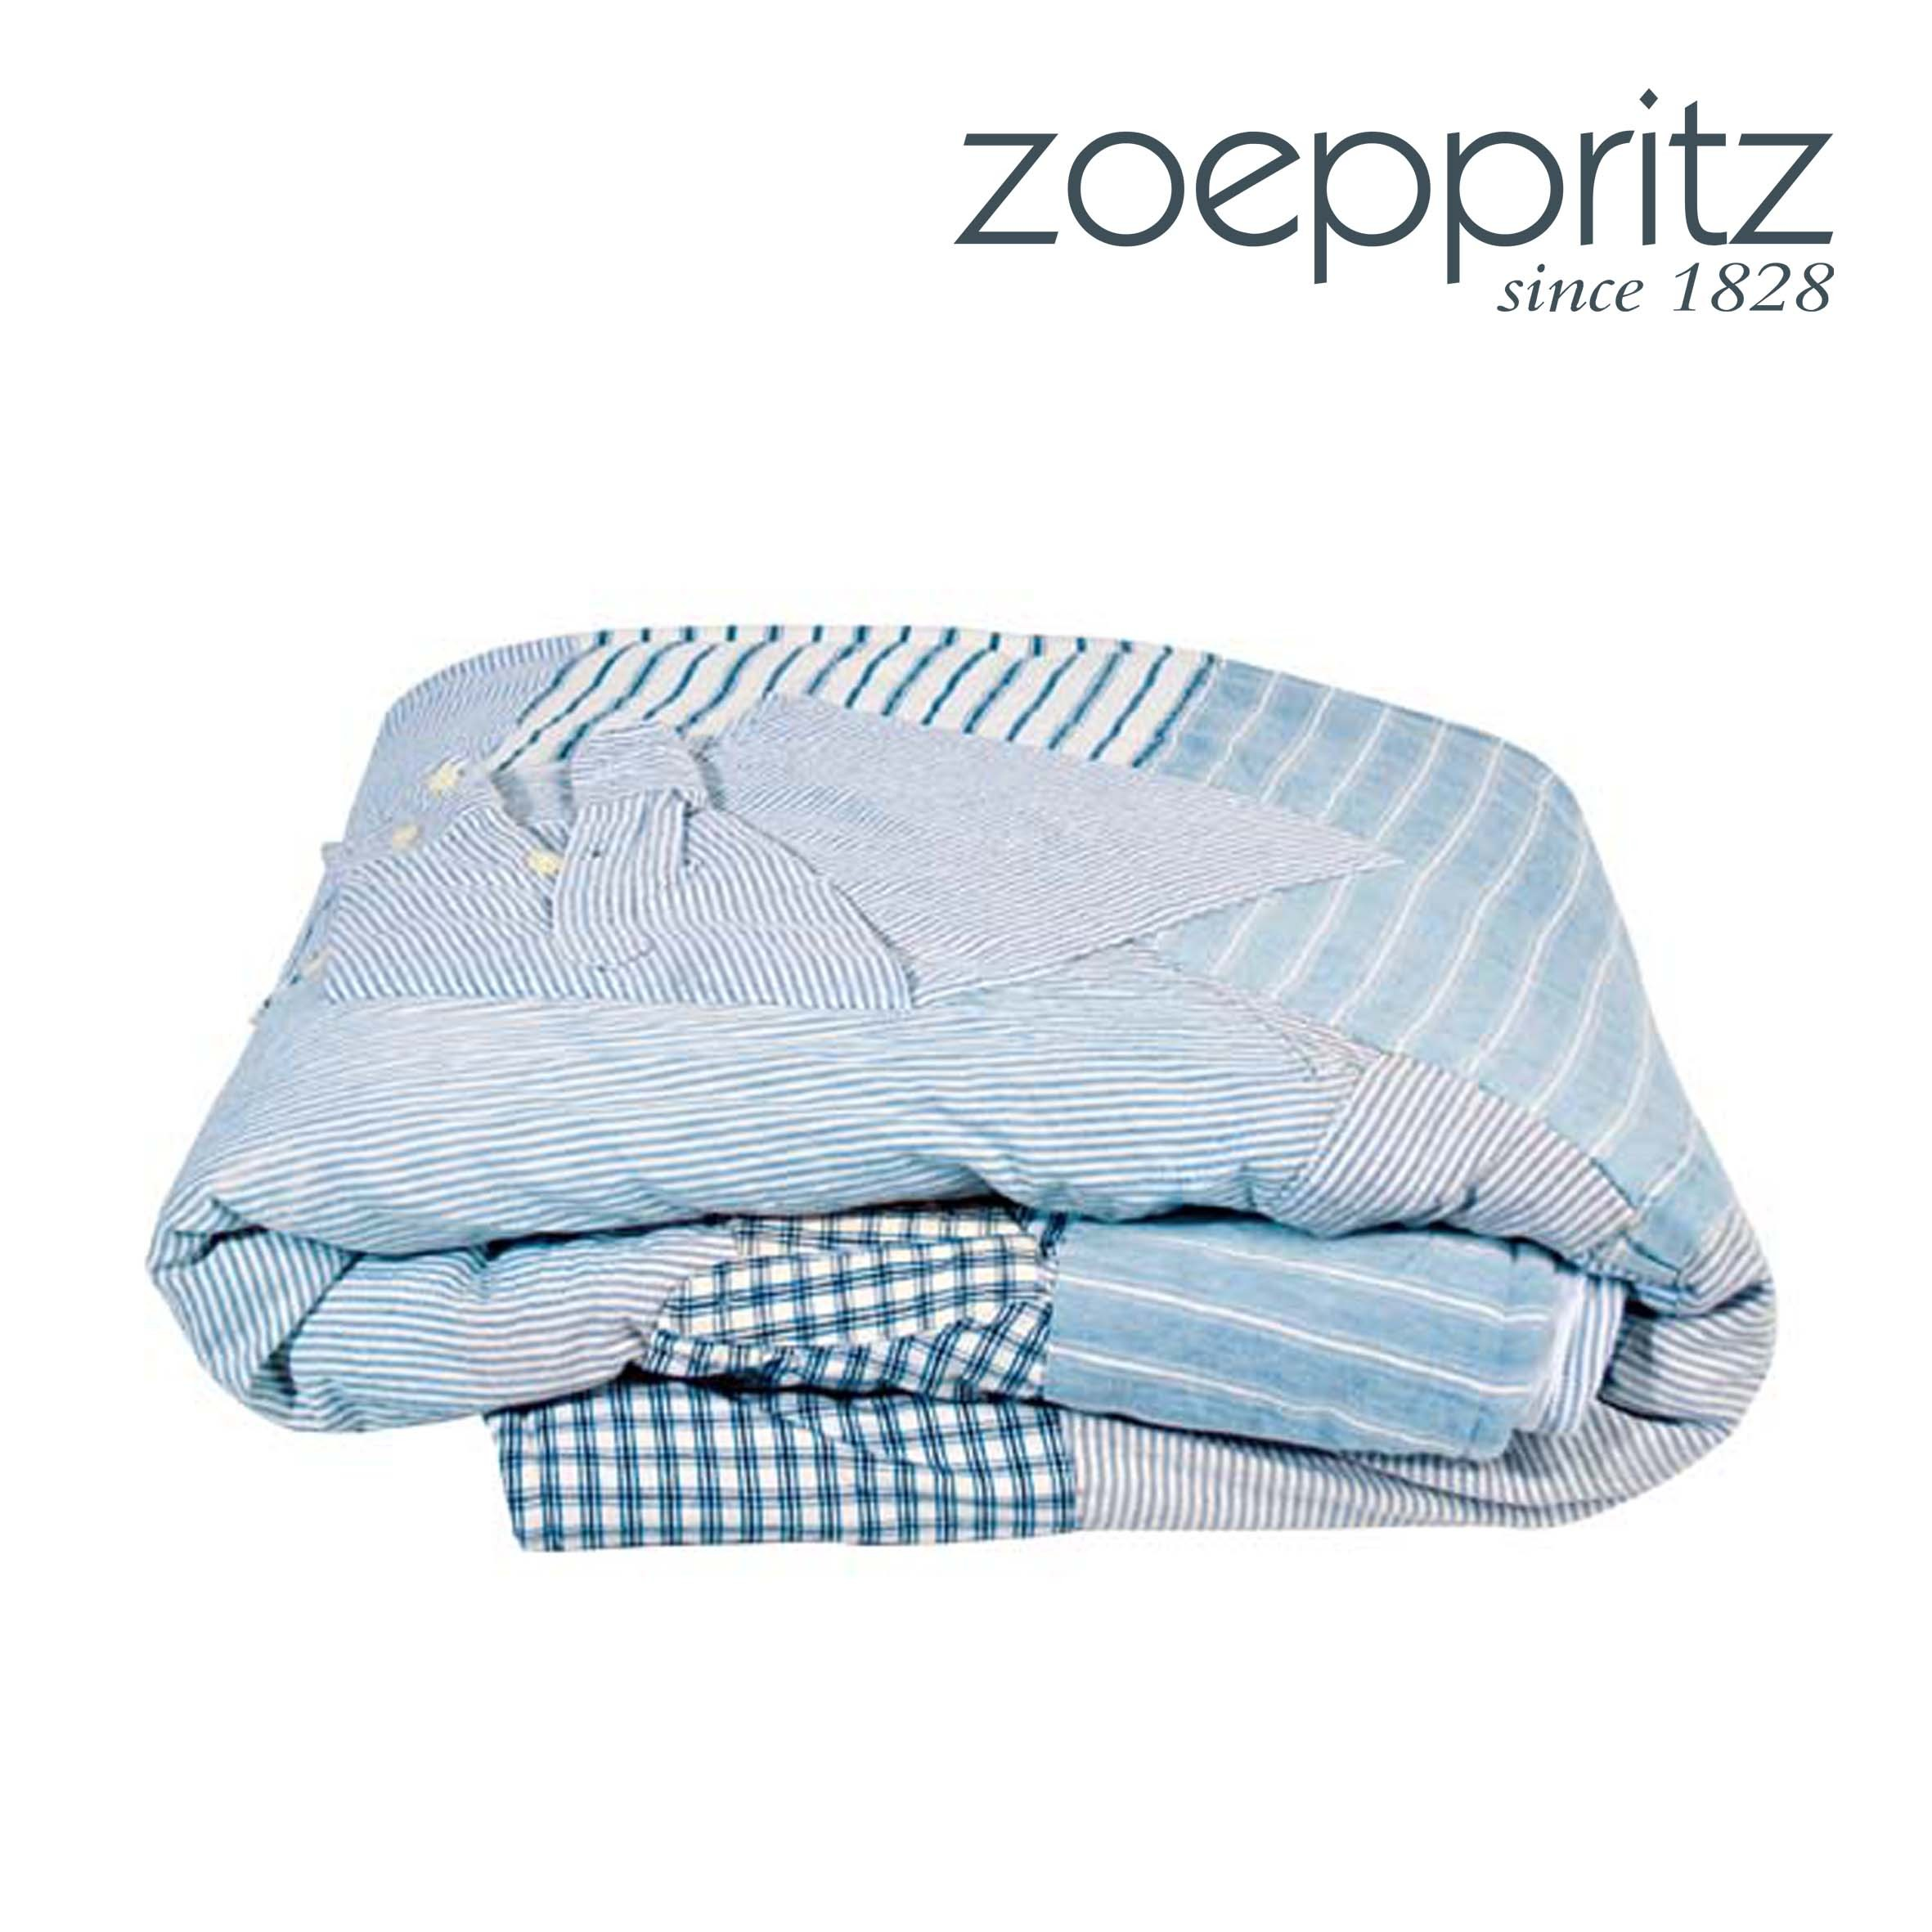 zoeppritz decke shirt blau. Black Bedroom Furniture Sets. Home Design Ideas